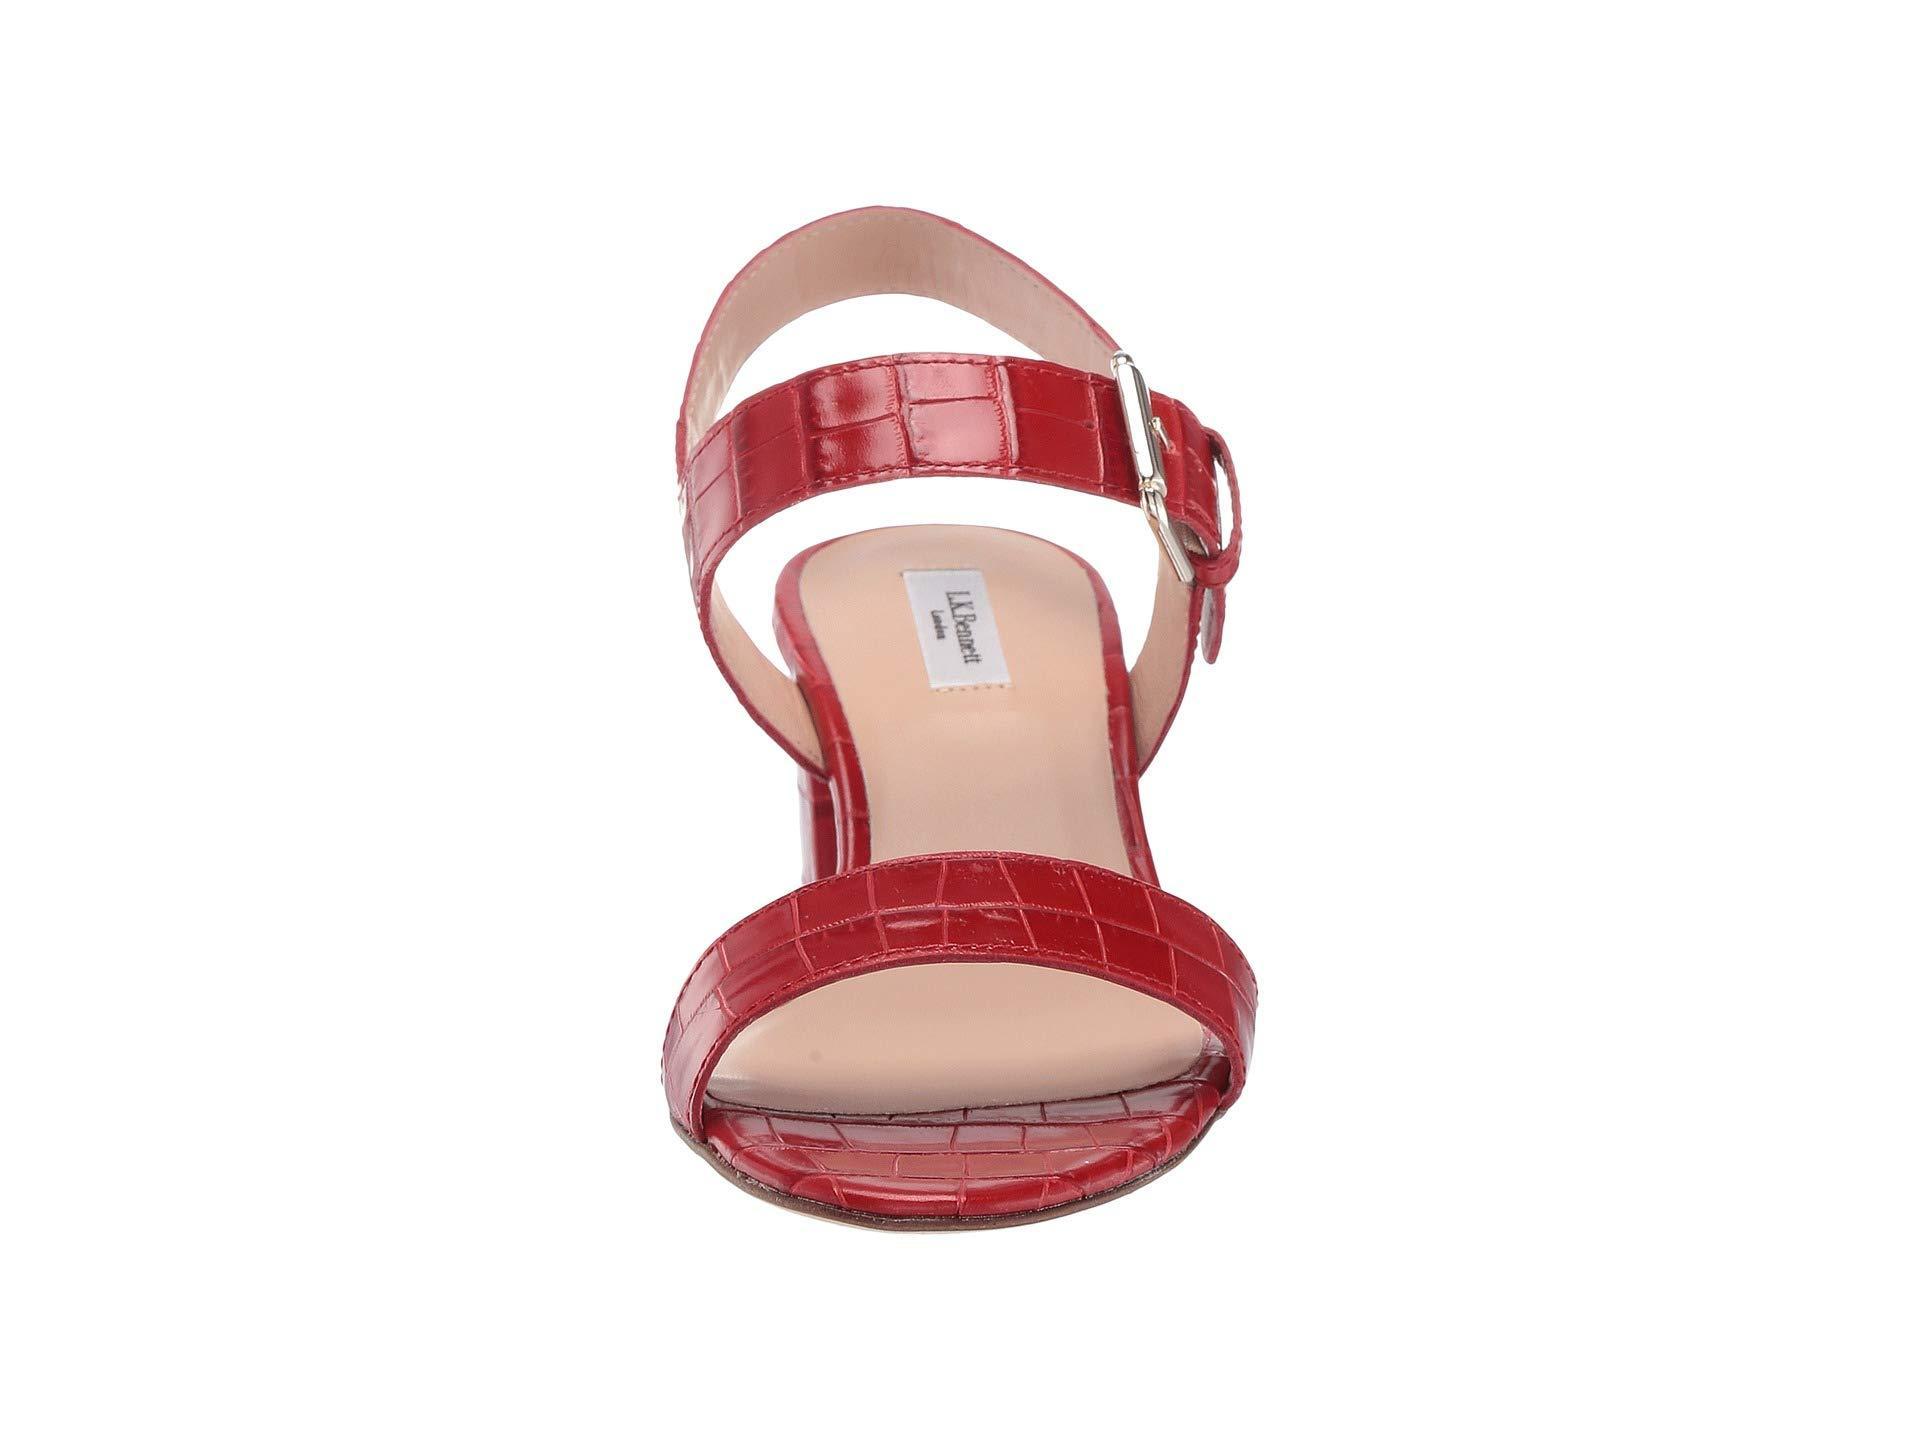 Lyst Heelroca In k L bennett Pelham Block RedHigh Red Heels rtQCshd